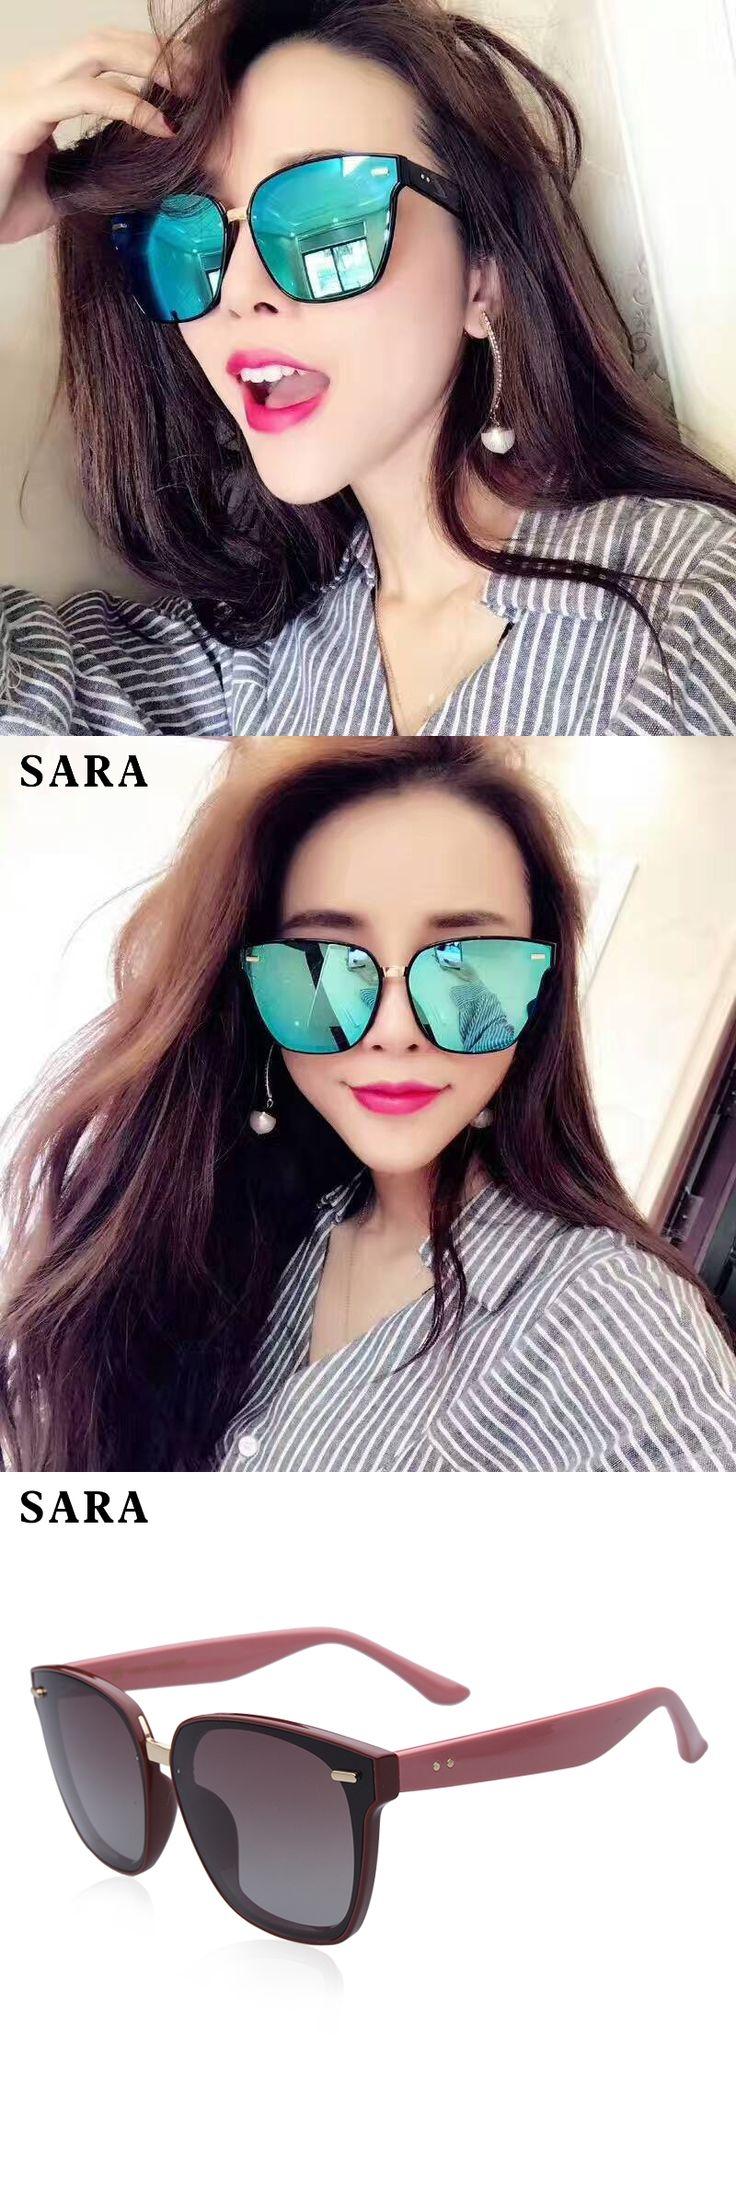 SARA New HD Polarized Sunglasses Women TR90 Aluminum Frame Sunglasses UV400 Driving Eyewear oculos Shades gafas de sol mujer 555